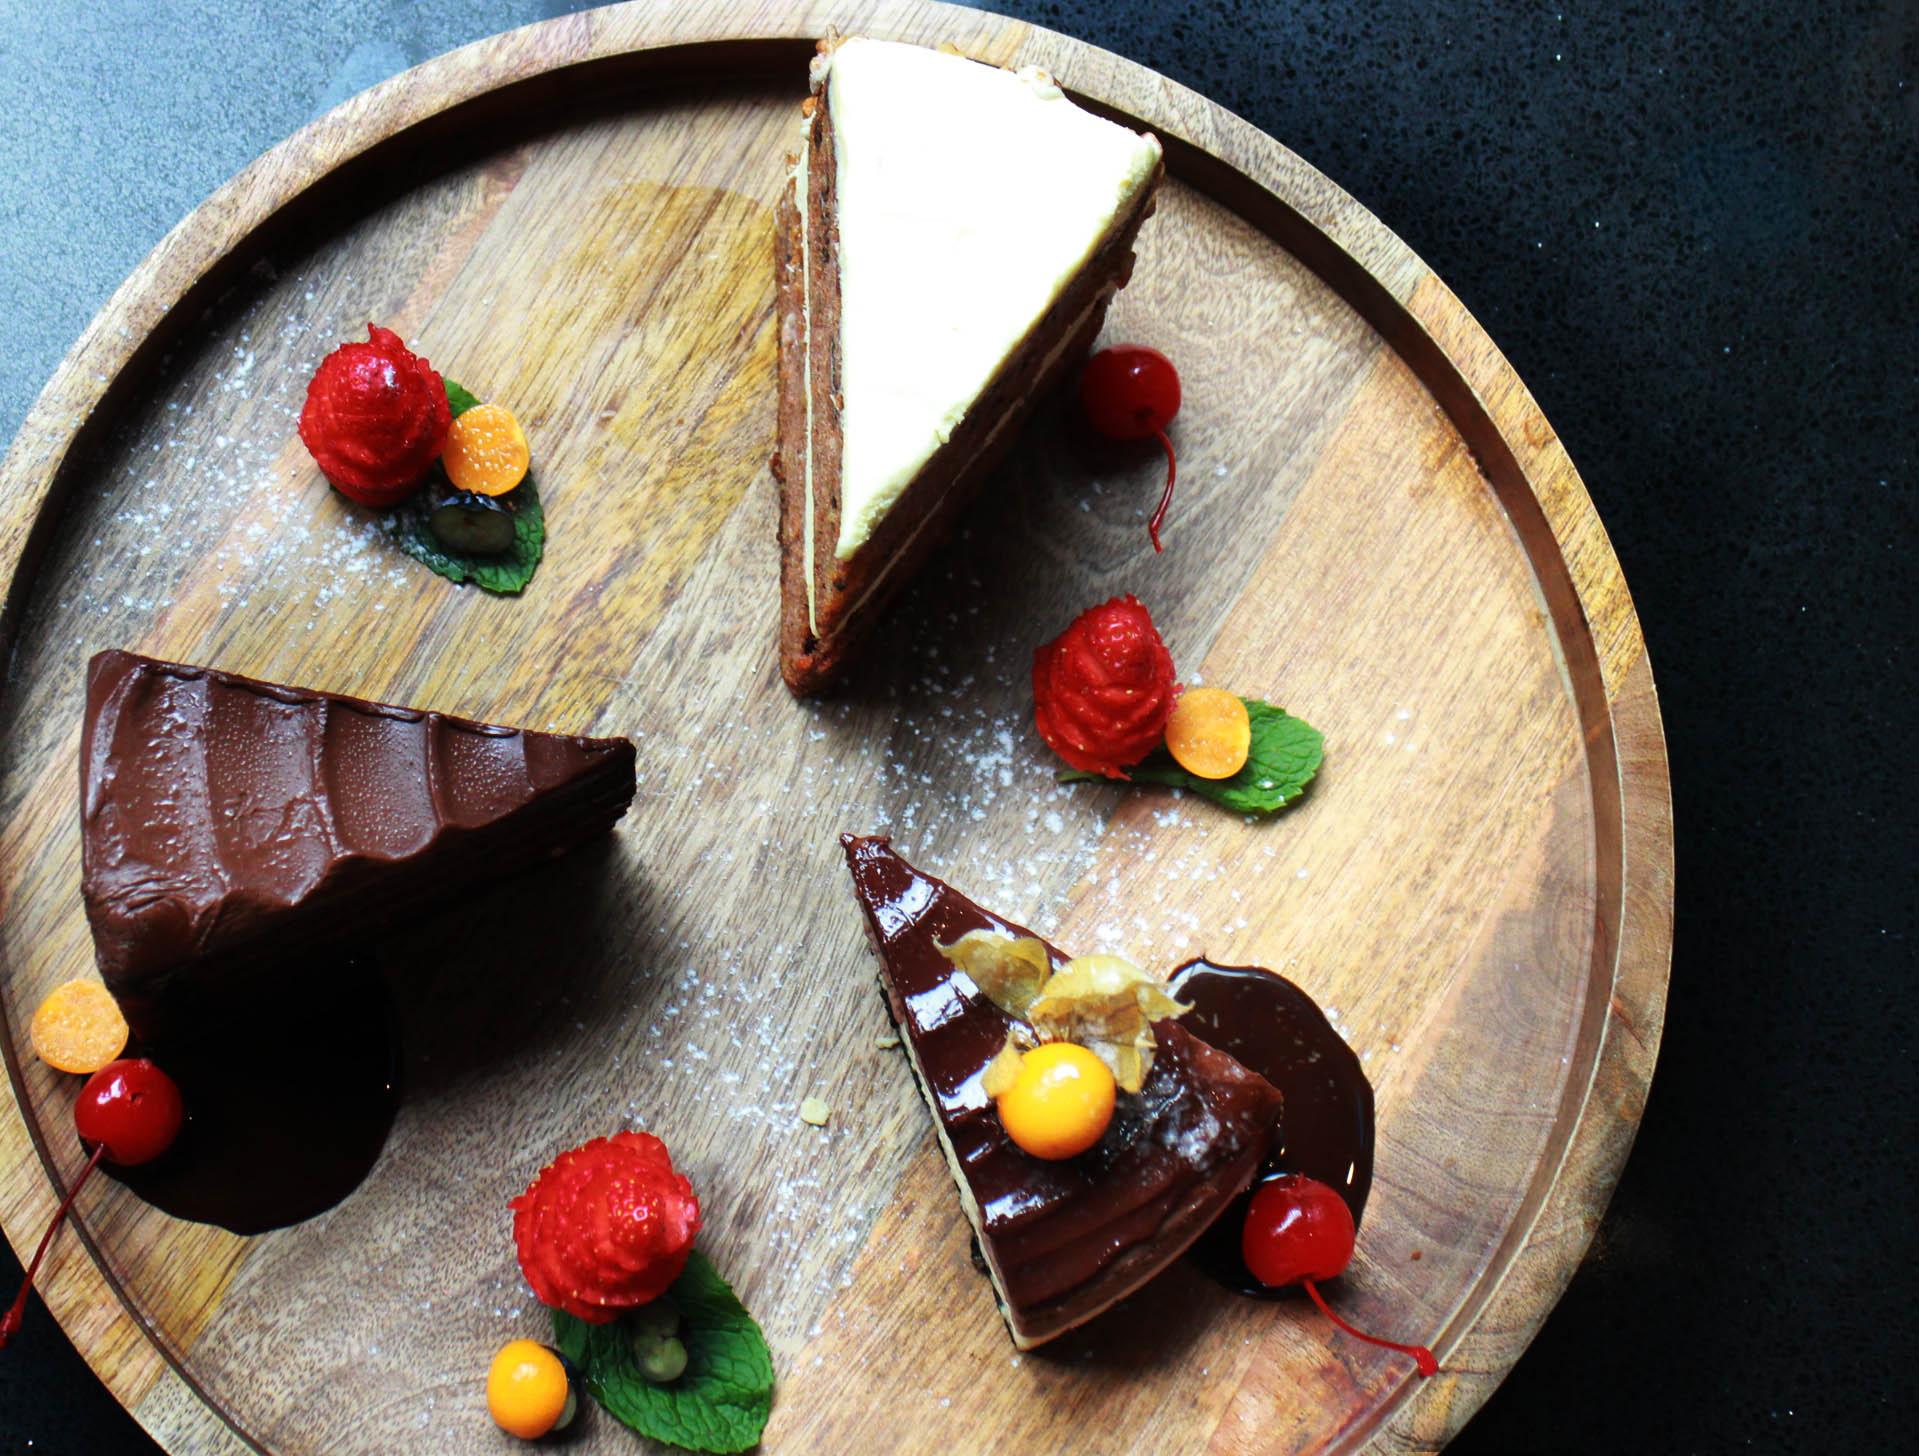 From top to bottom, American Carrot Cake. Sea Salt Caramel Chocolate Cake and Hazelnut Chocolate Cheesecake (all $12)